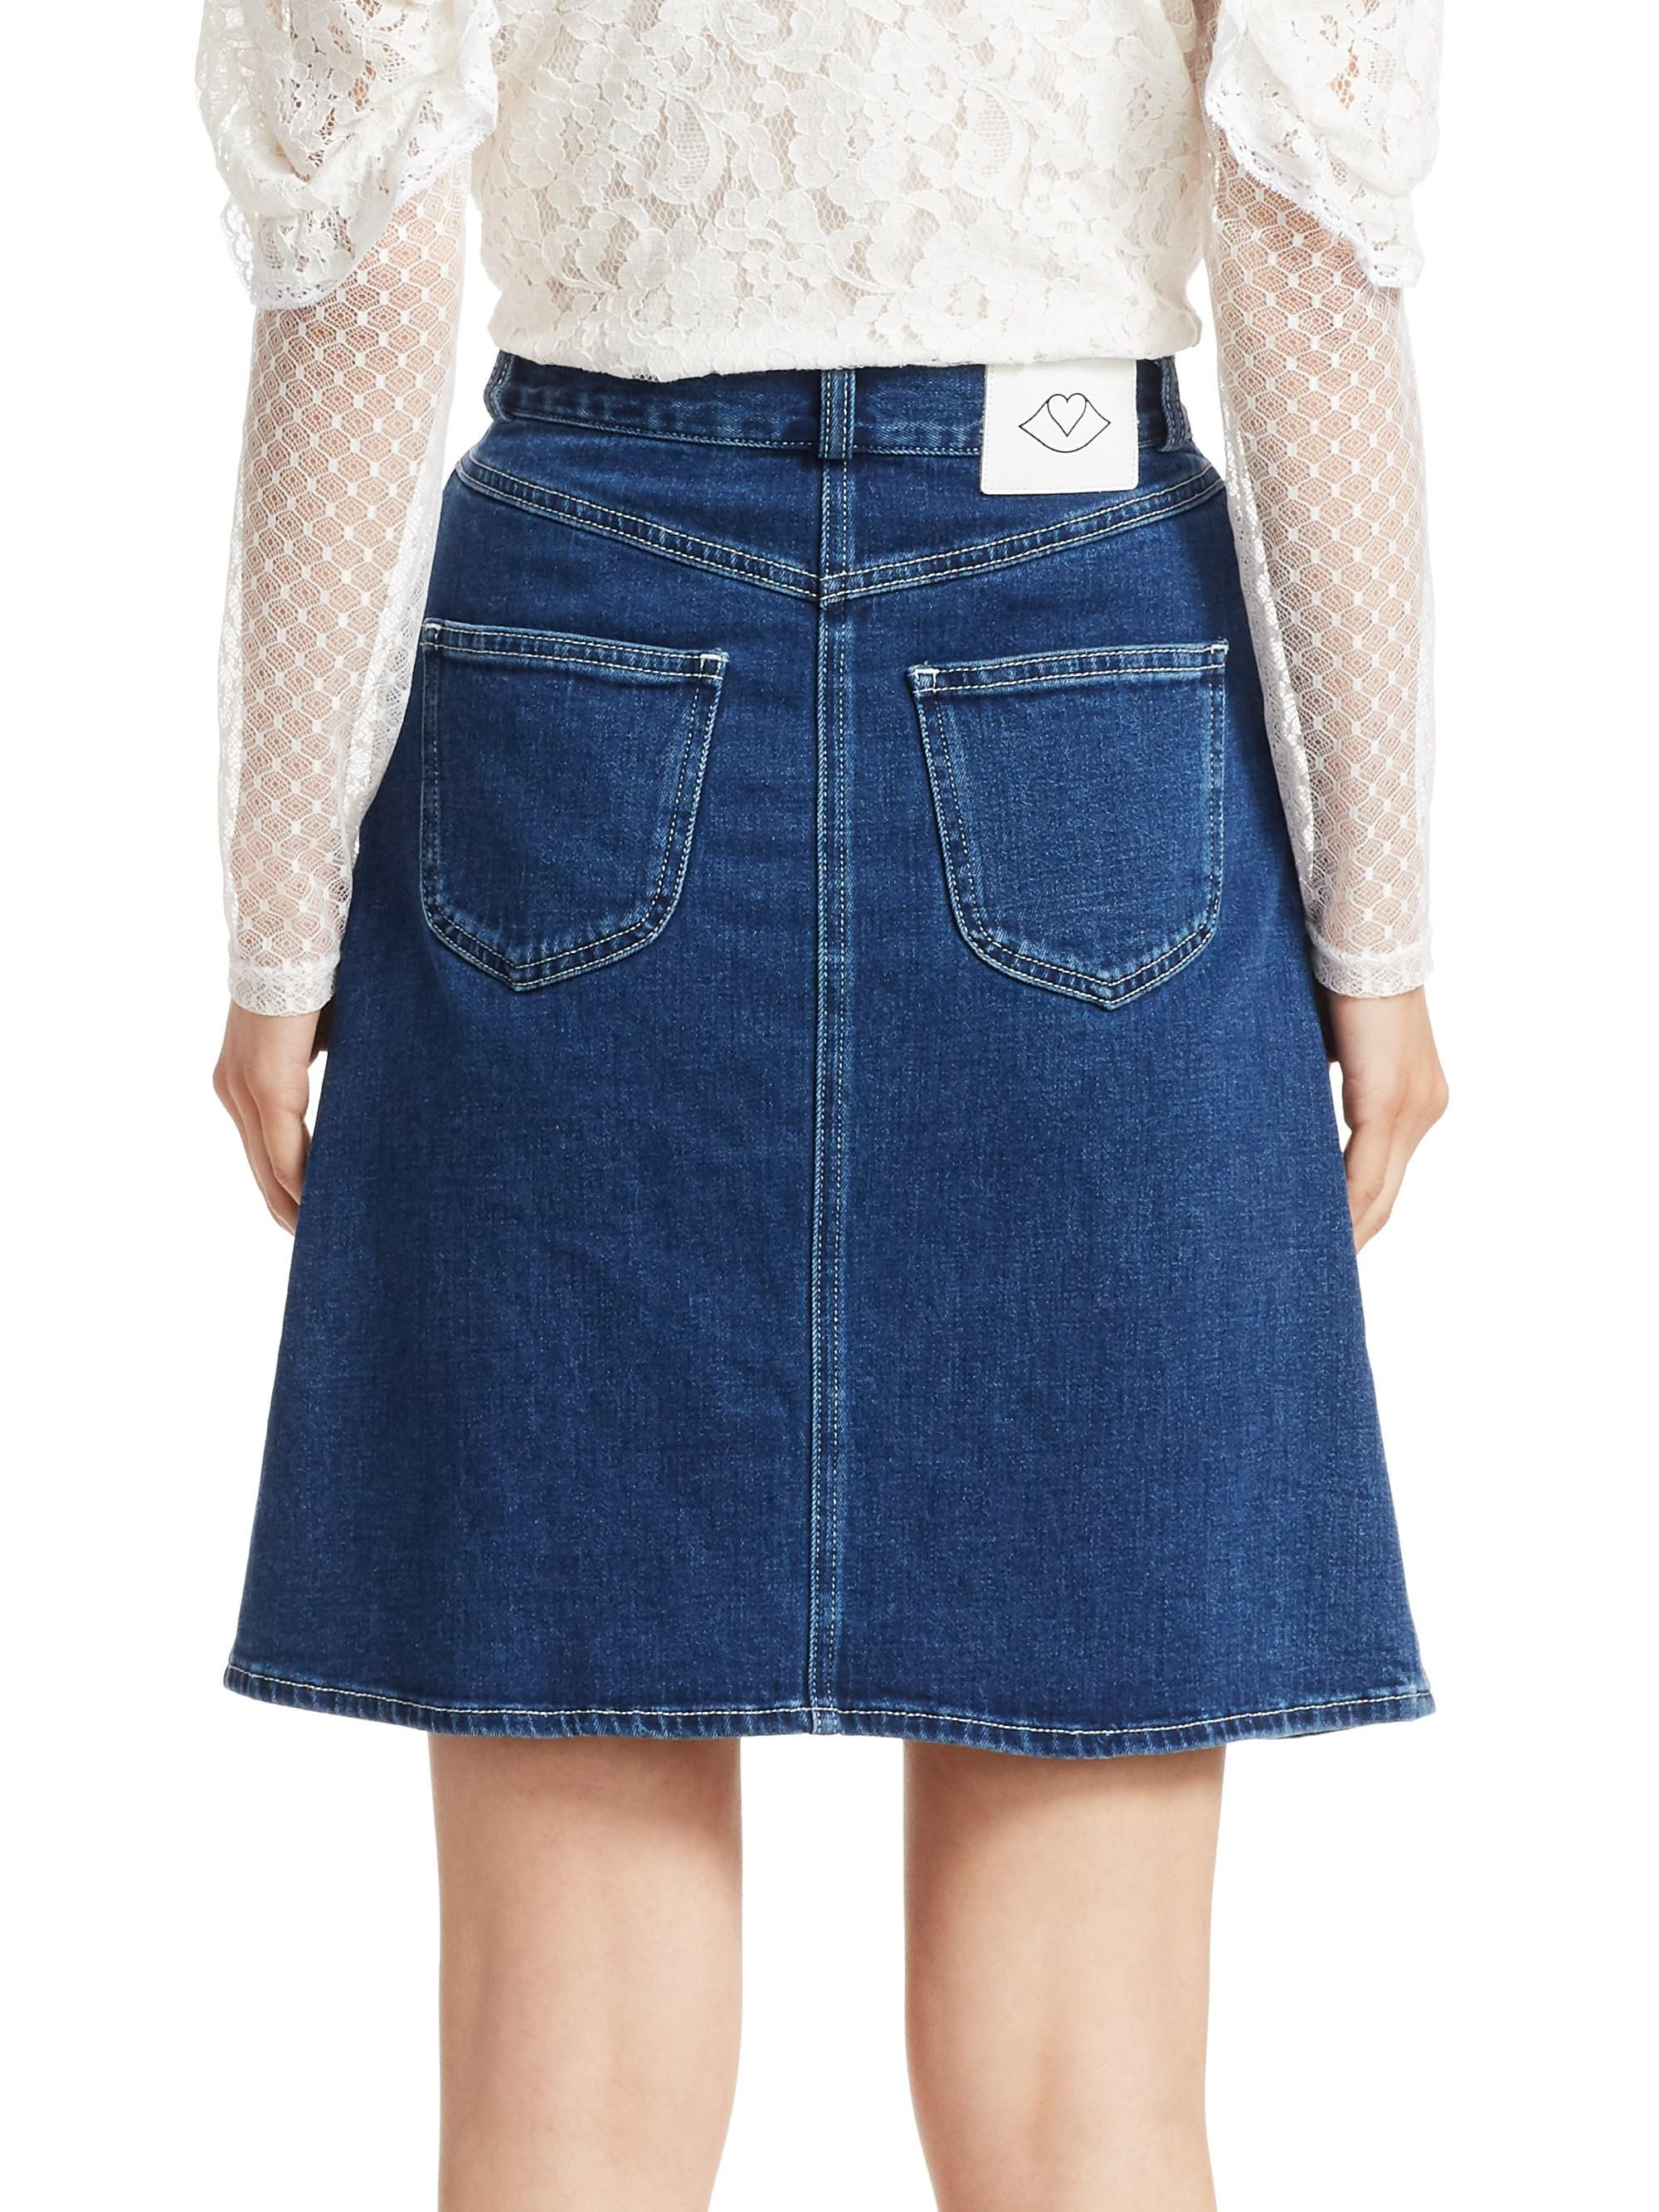 93dccf71d143e Lyst - See By Chloé Braided Denim Skirt in Blue